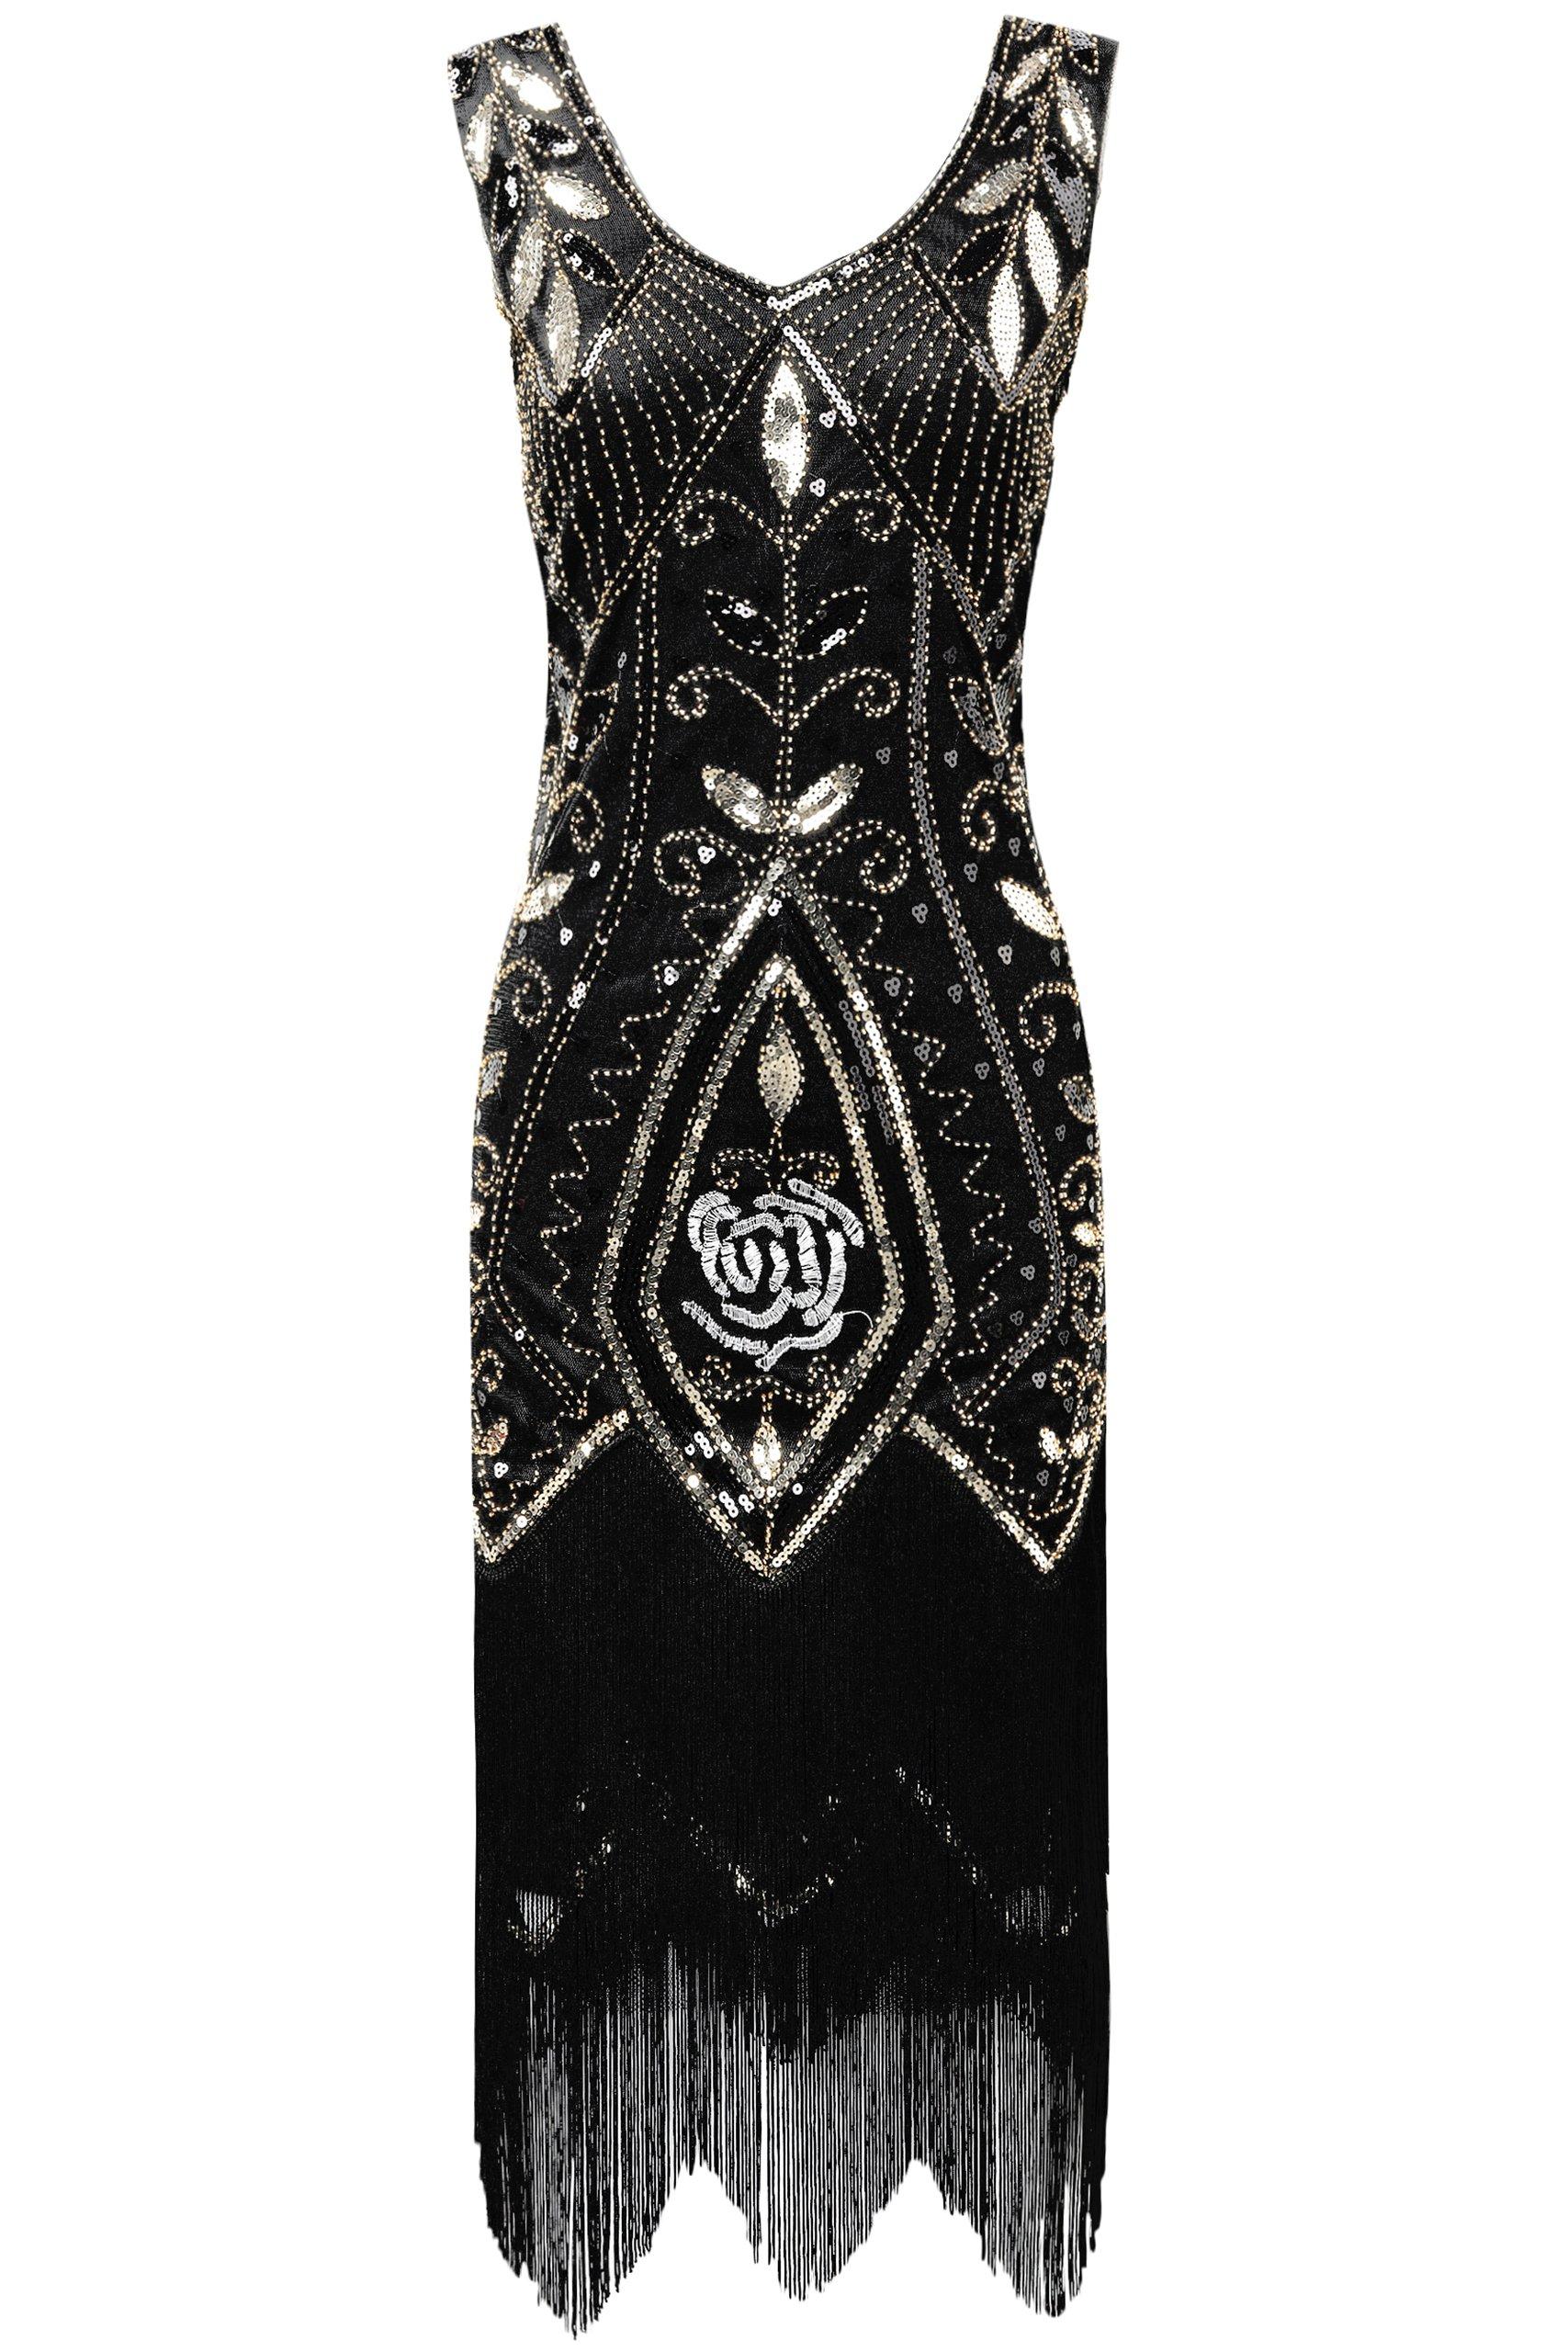 599b594251 BABEYOND 1920s Flapper Fancy Dress Art Deco Fringed Sequin Dress Roaring  20s Gatsby Costume Dress Vintage Beaded Evening Dress (Black Gold